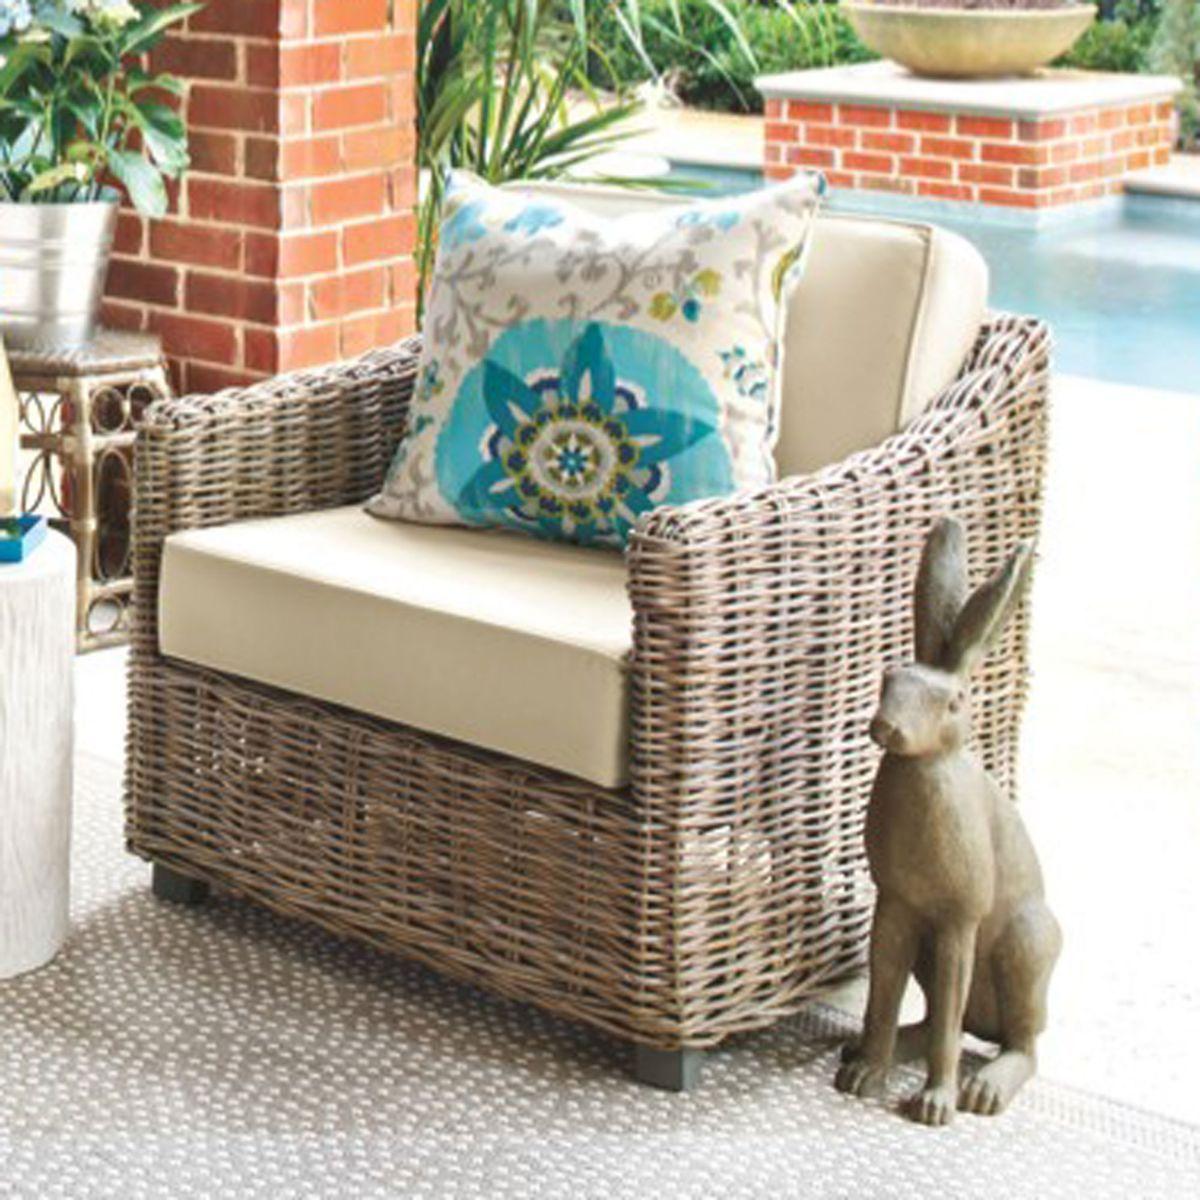 Outdoor Furniture | Outdoor Cushions | Outdoor Planters | Ballard Designs